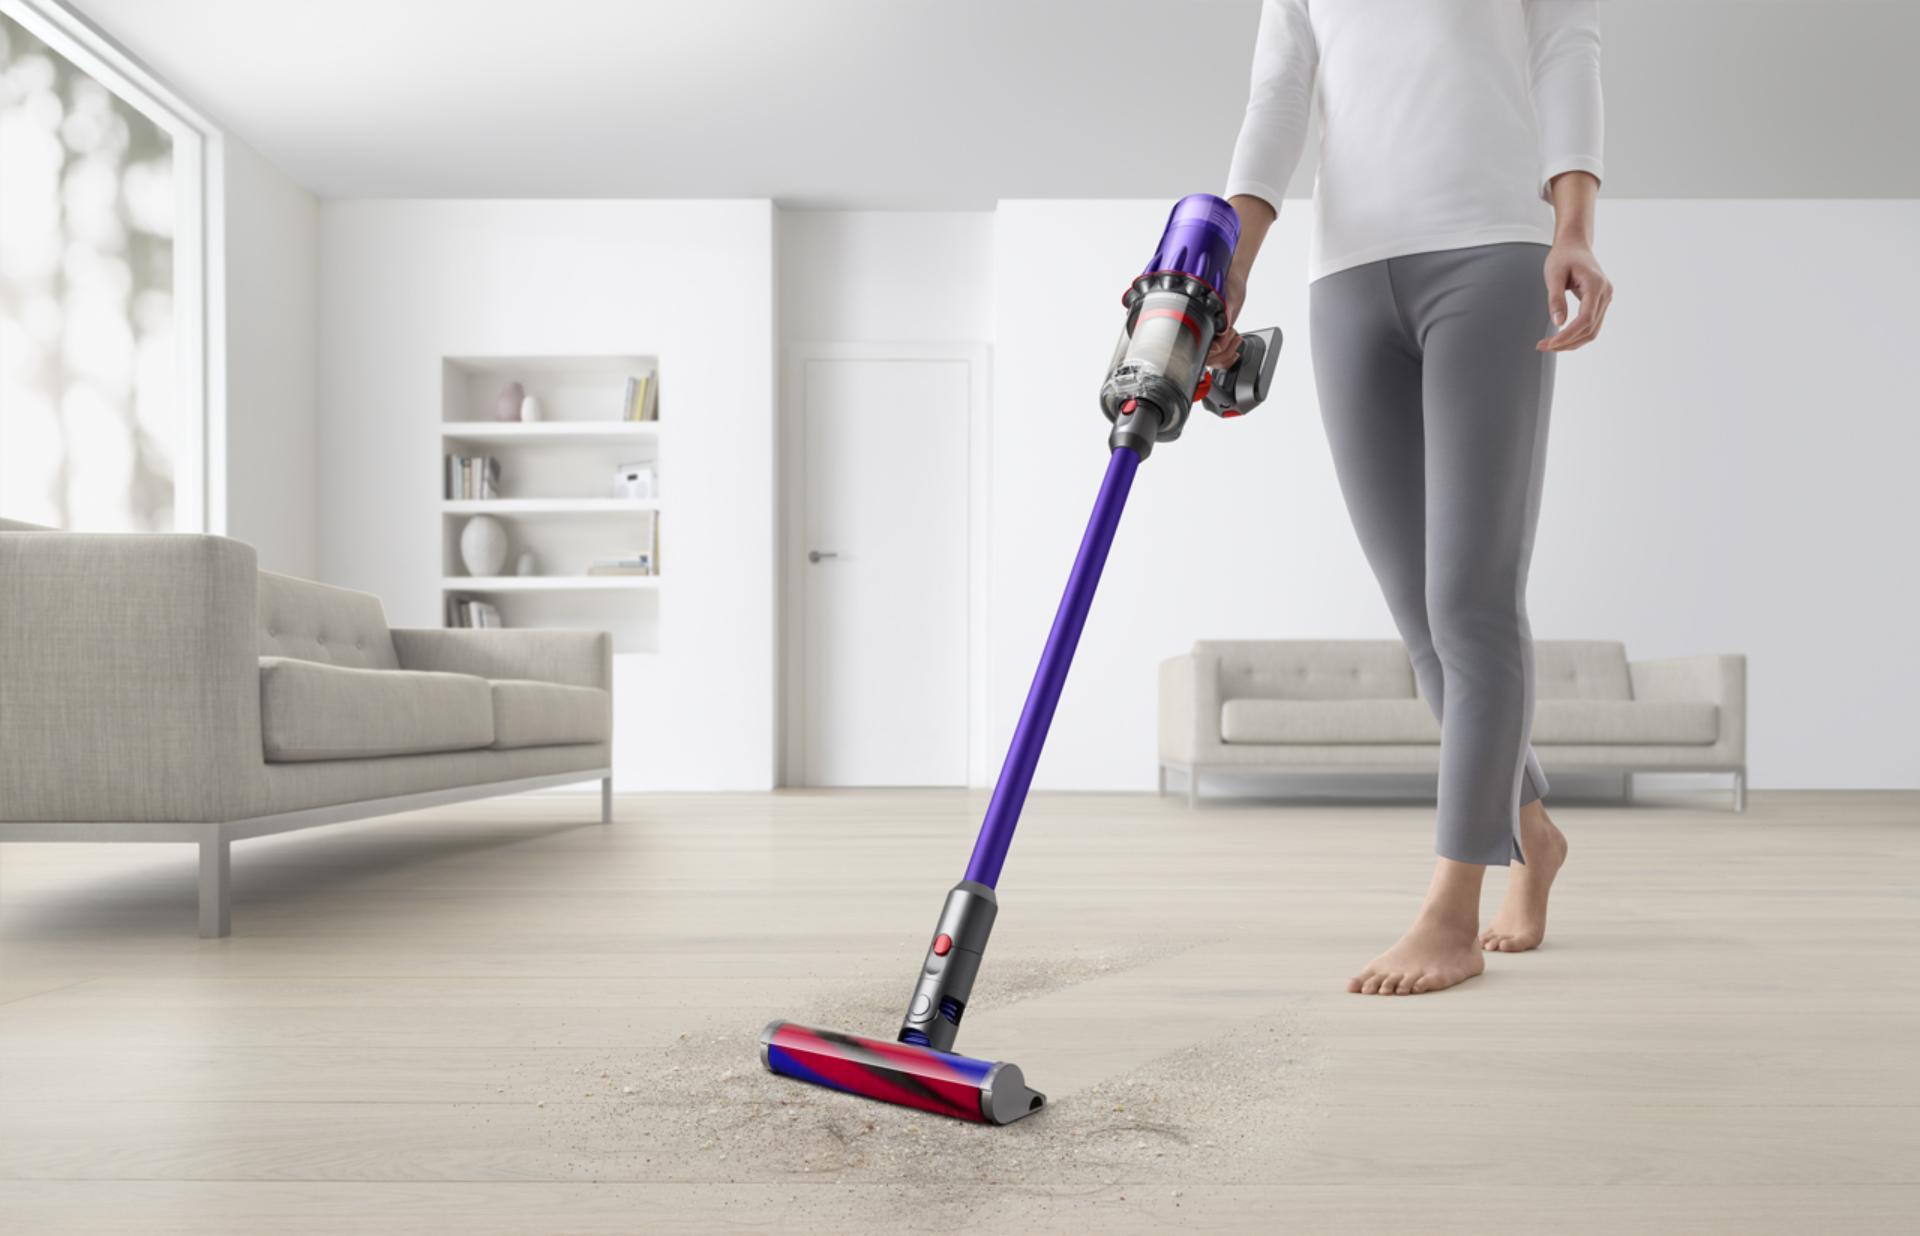 Dyson digital slim vacuum cleaner